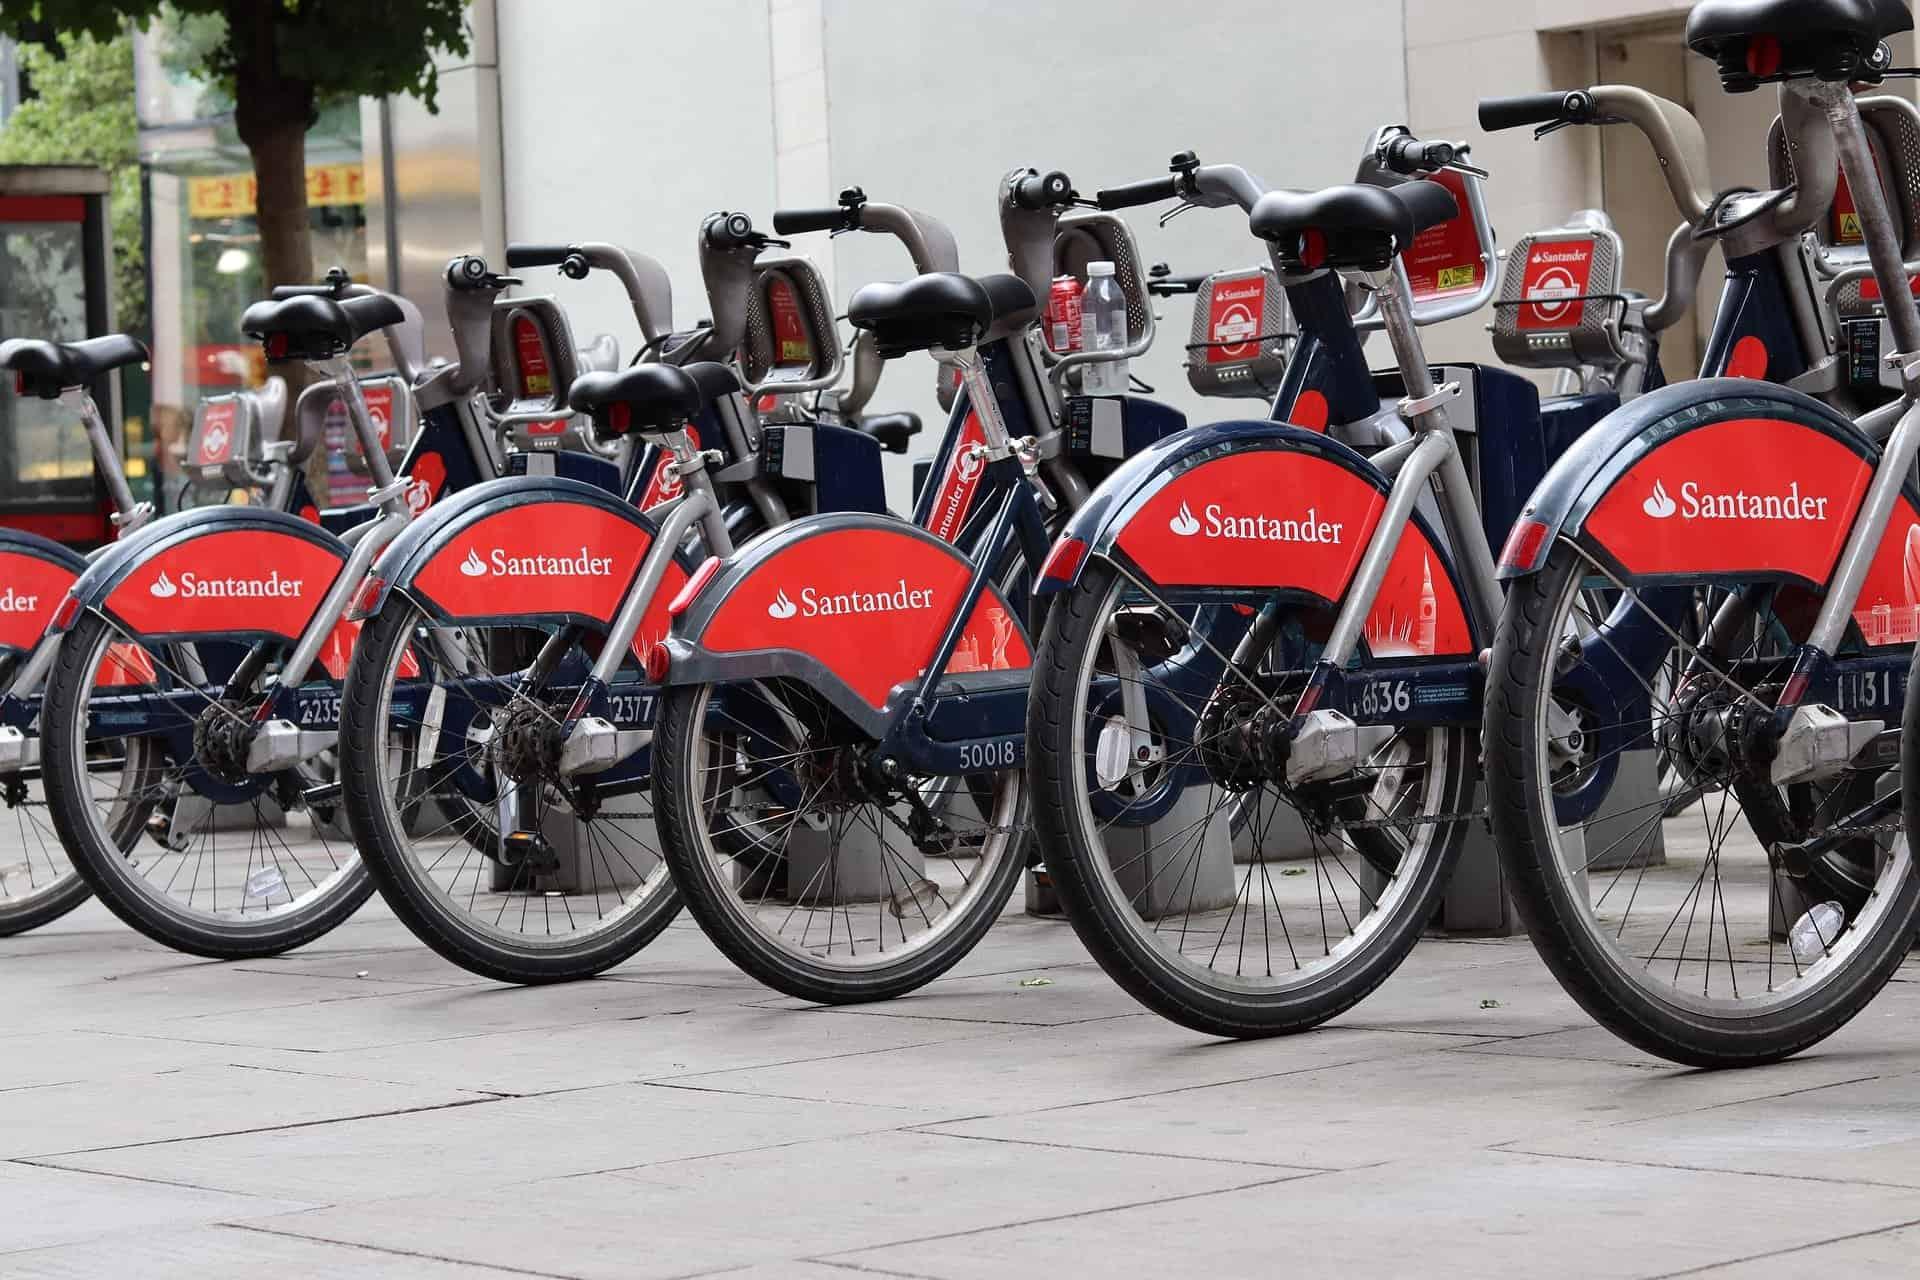 santander public bikes lined up